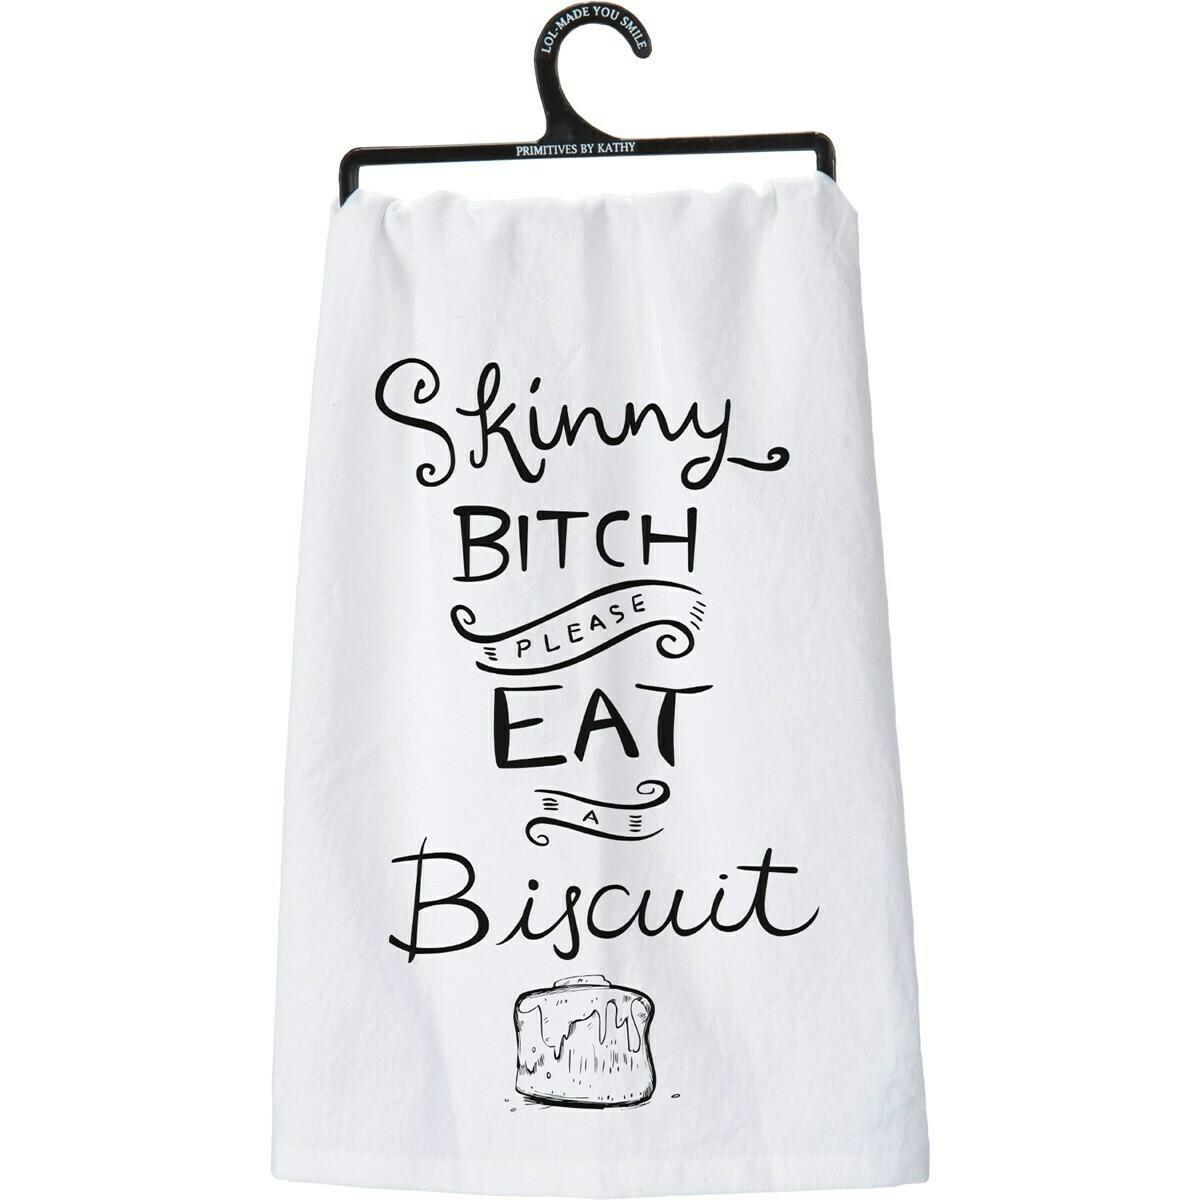 Eat a Biscuit Towel